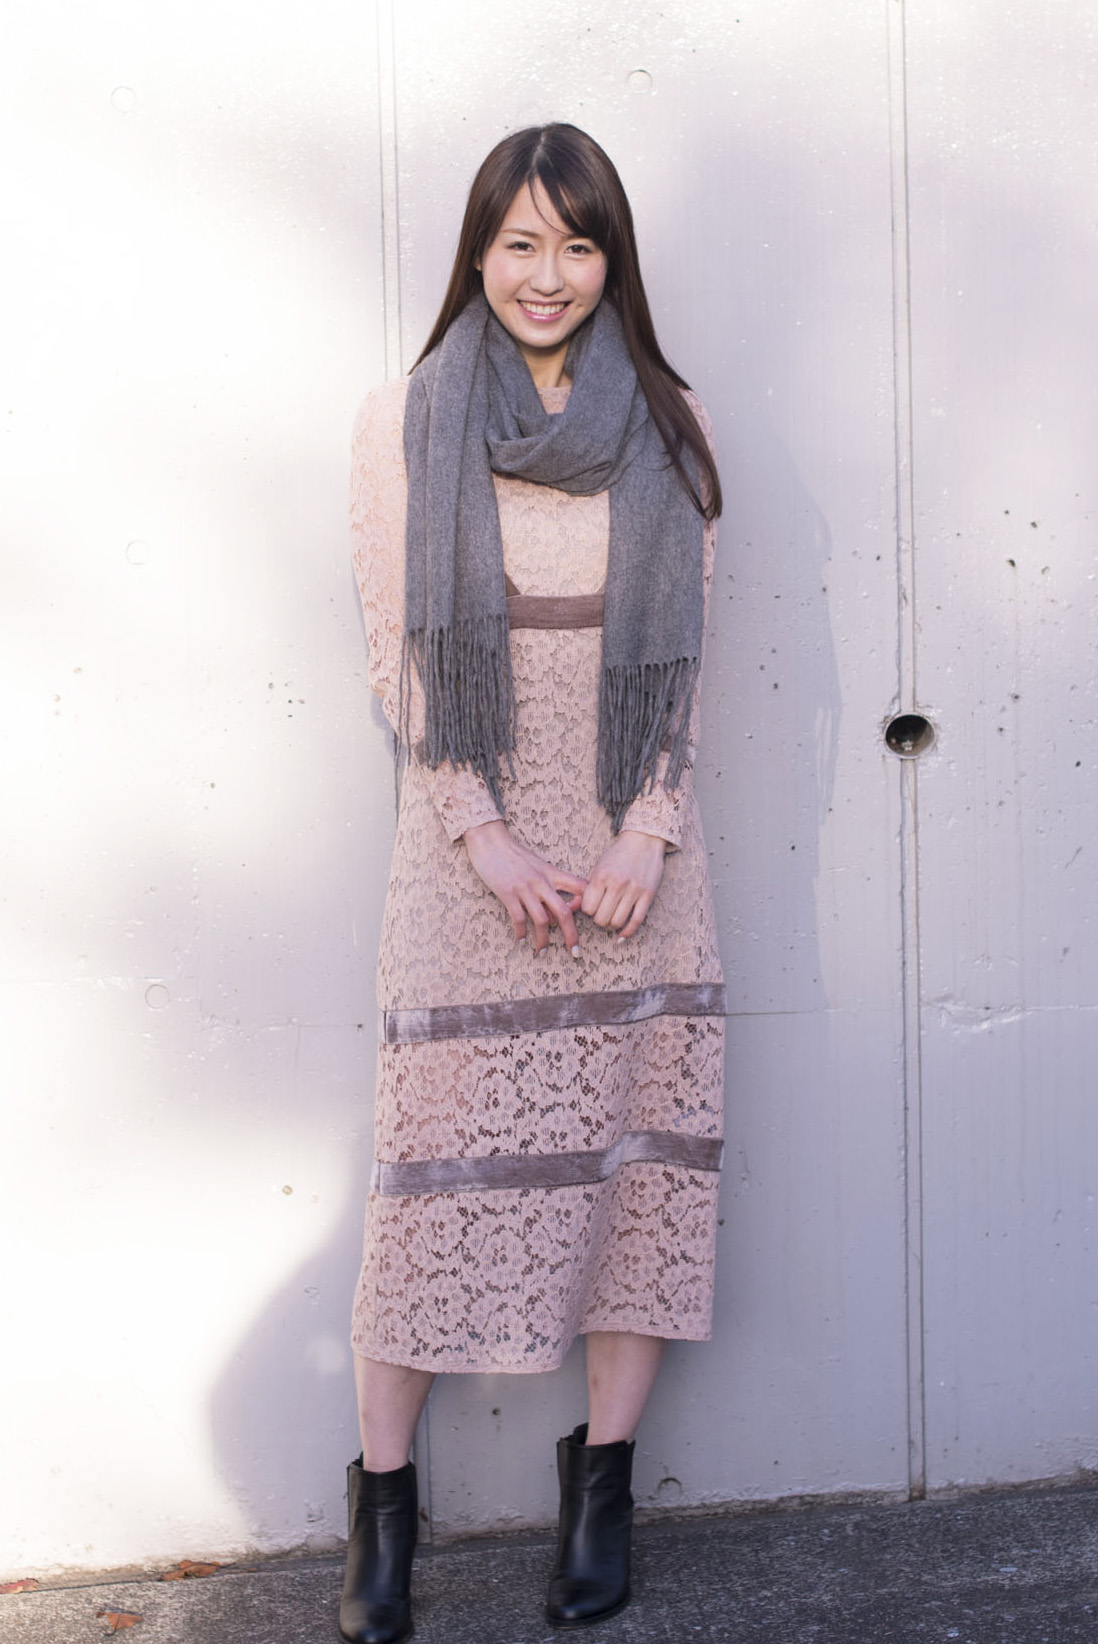 松島 未歩 イメージ画像